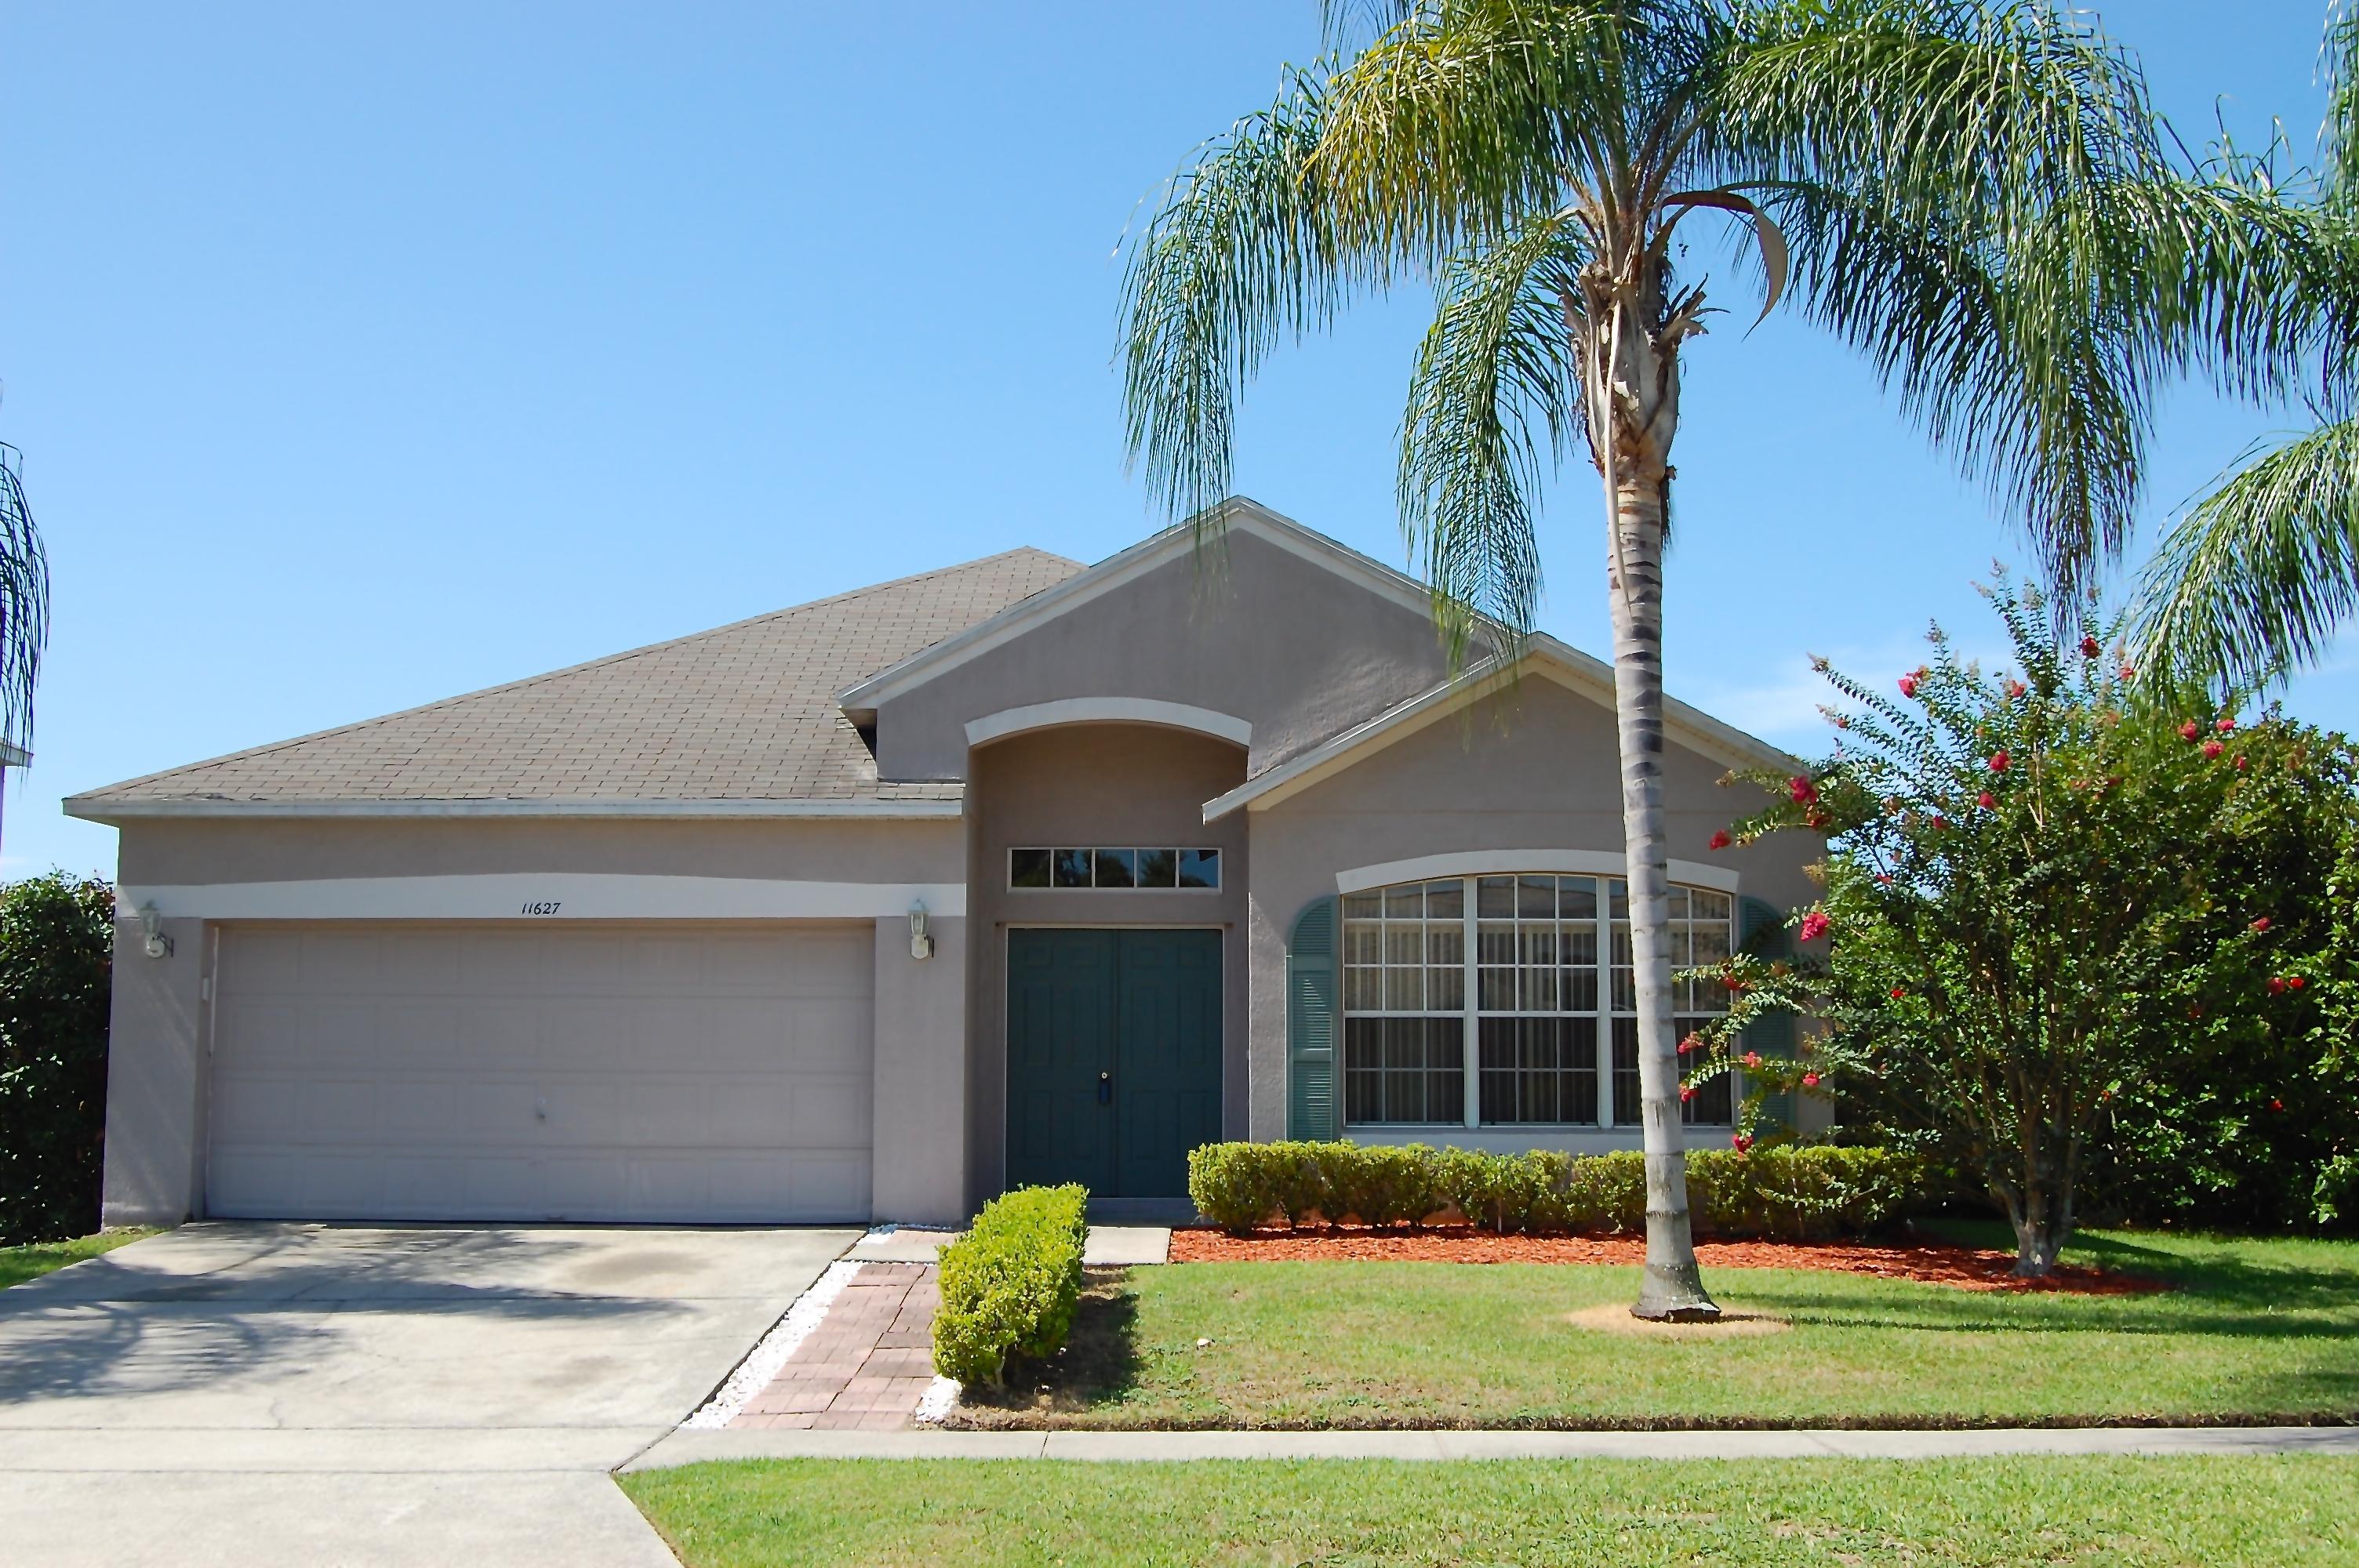 Moradia para Venda às Orlando, Florida 11627 Sir Winston Way Orlando, Florida 32824 Estados Unidos